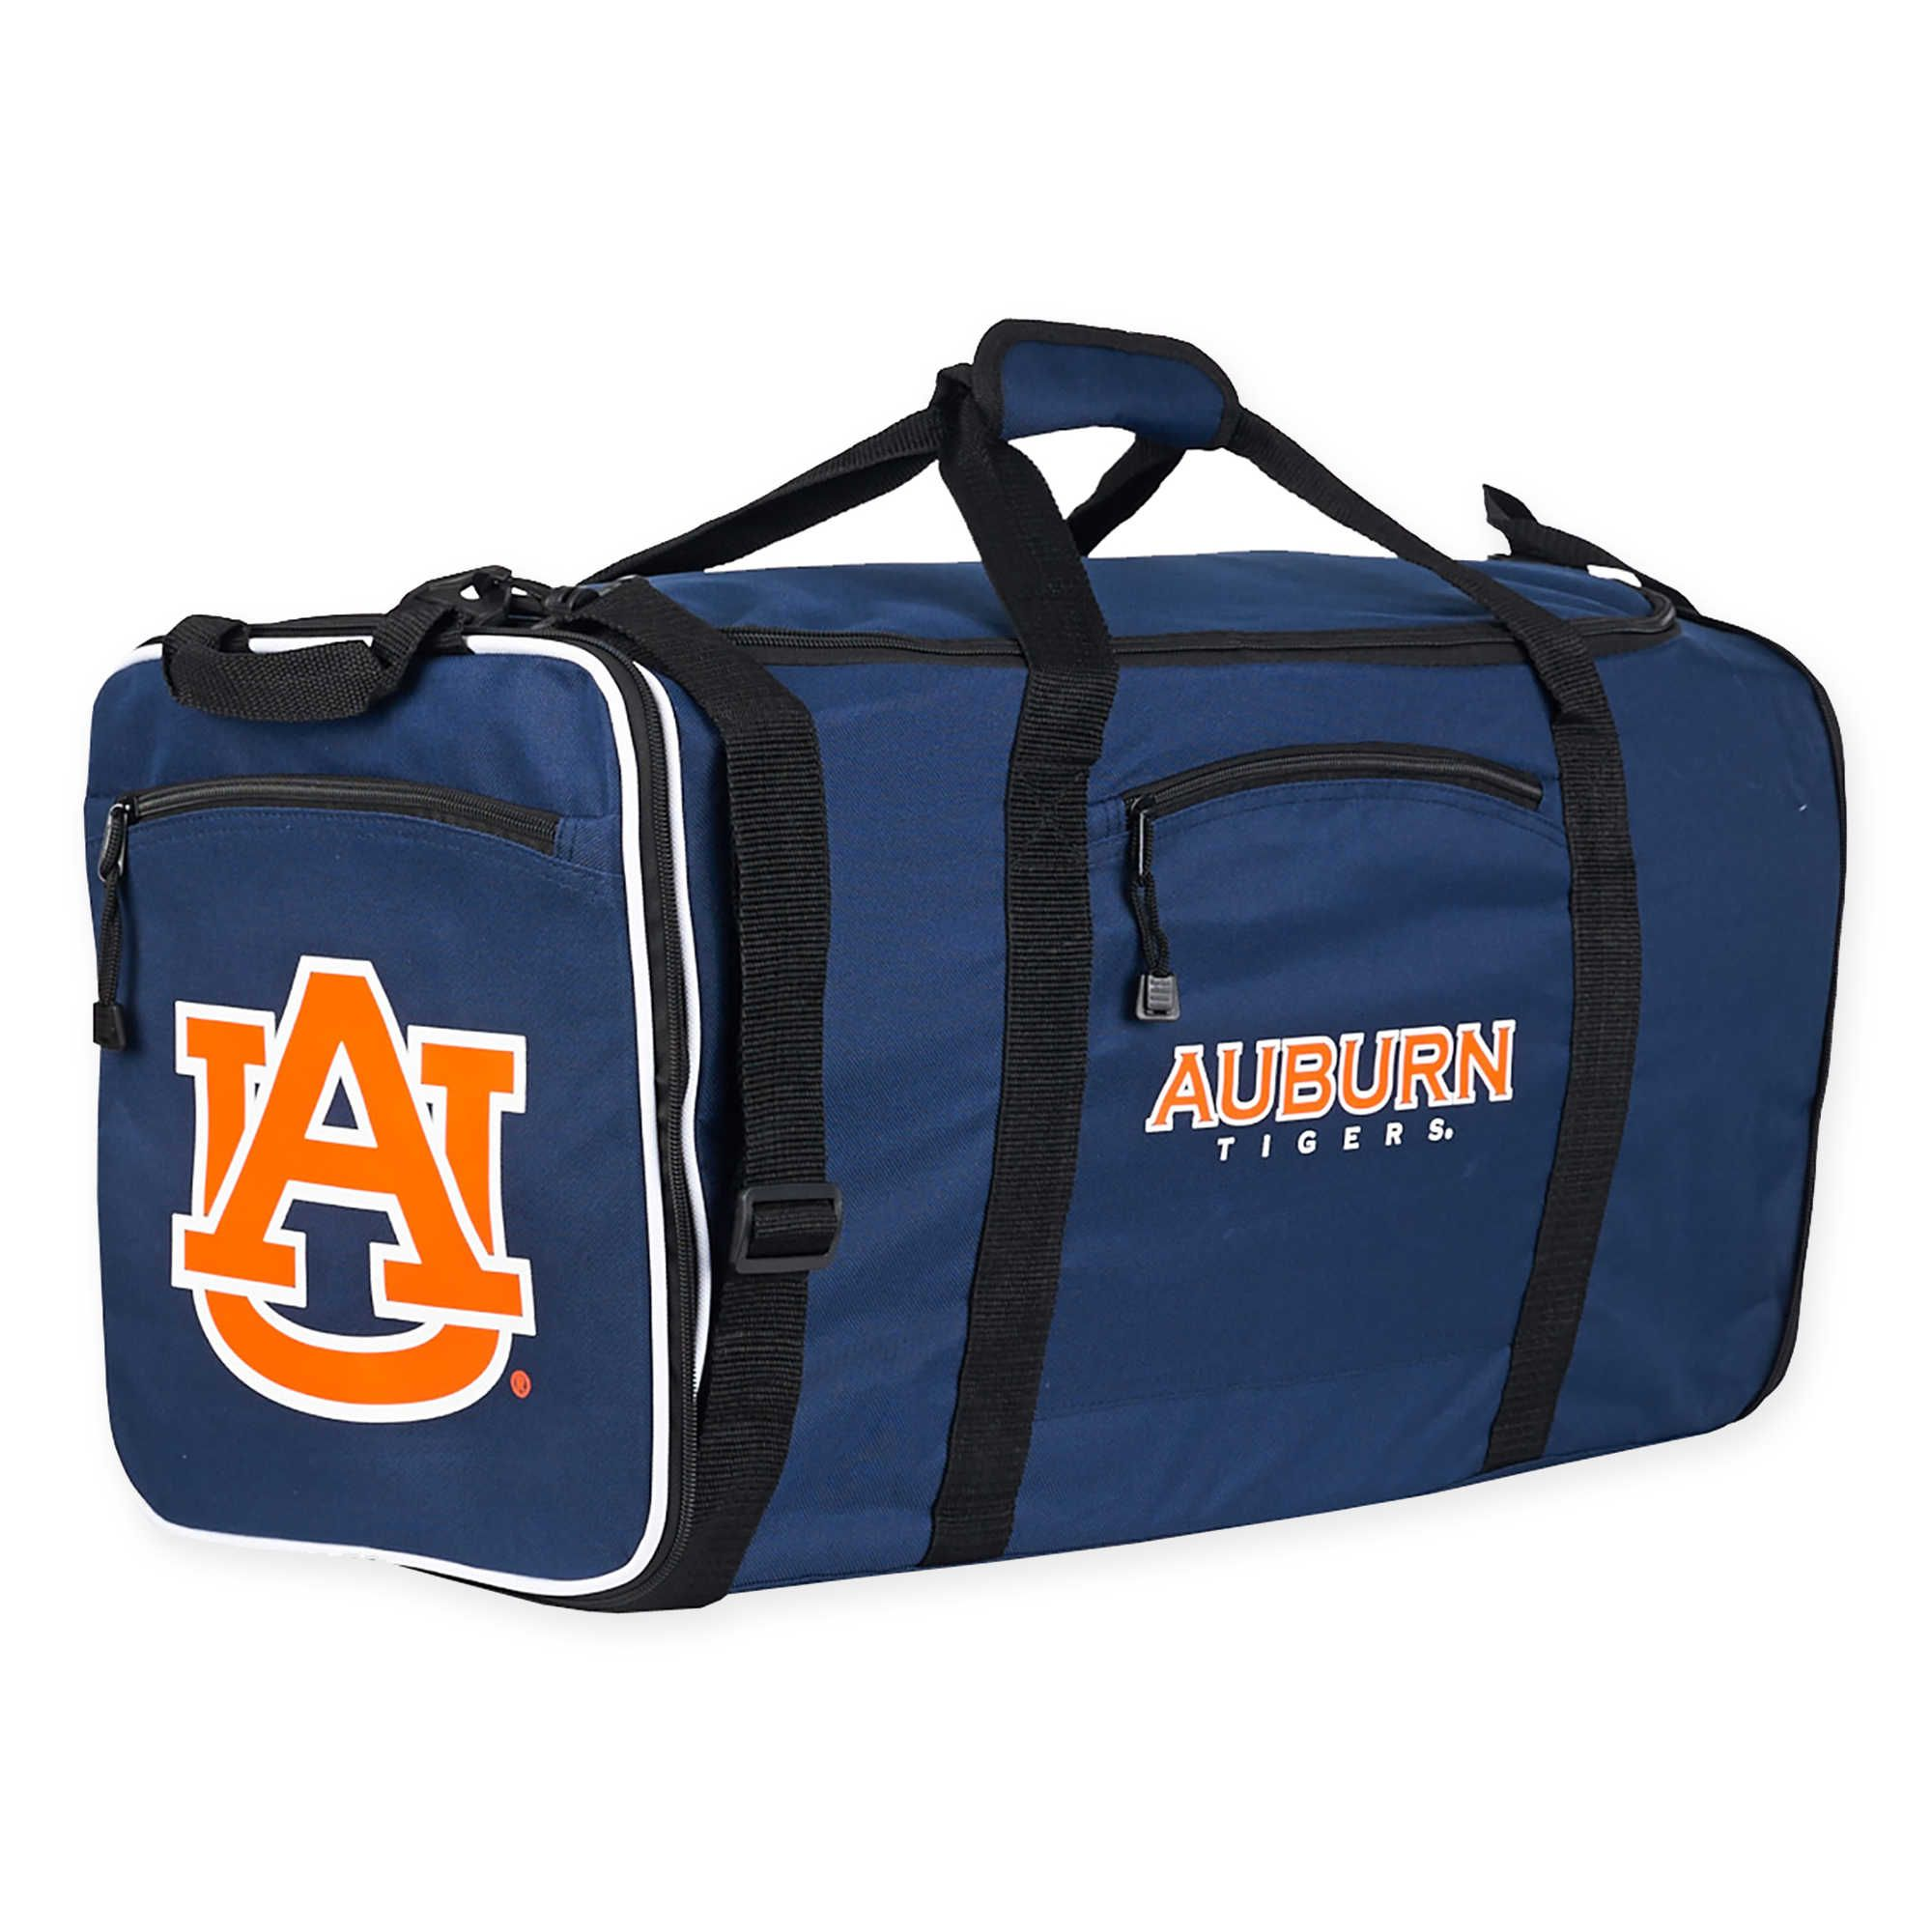 020c58ac4546 Auburn University 28-Inch Duffel Bag | AUBURN UNIV FAN! WAR EAGLE ...